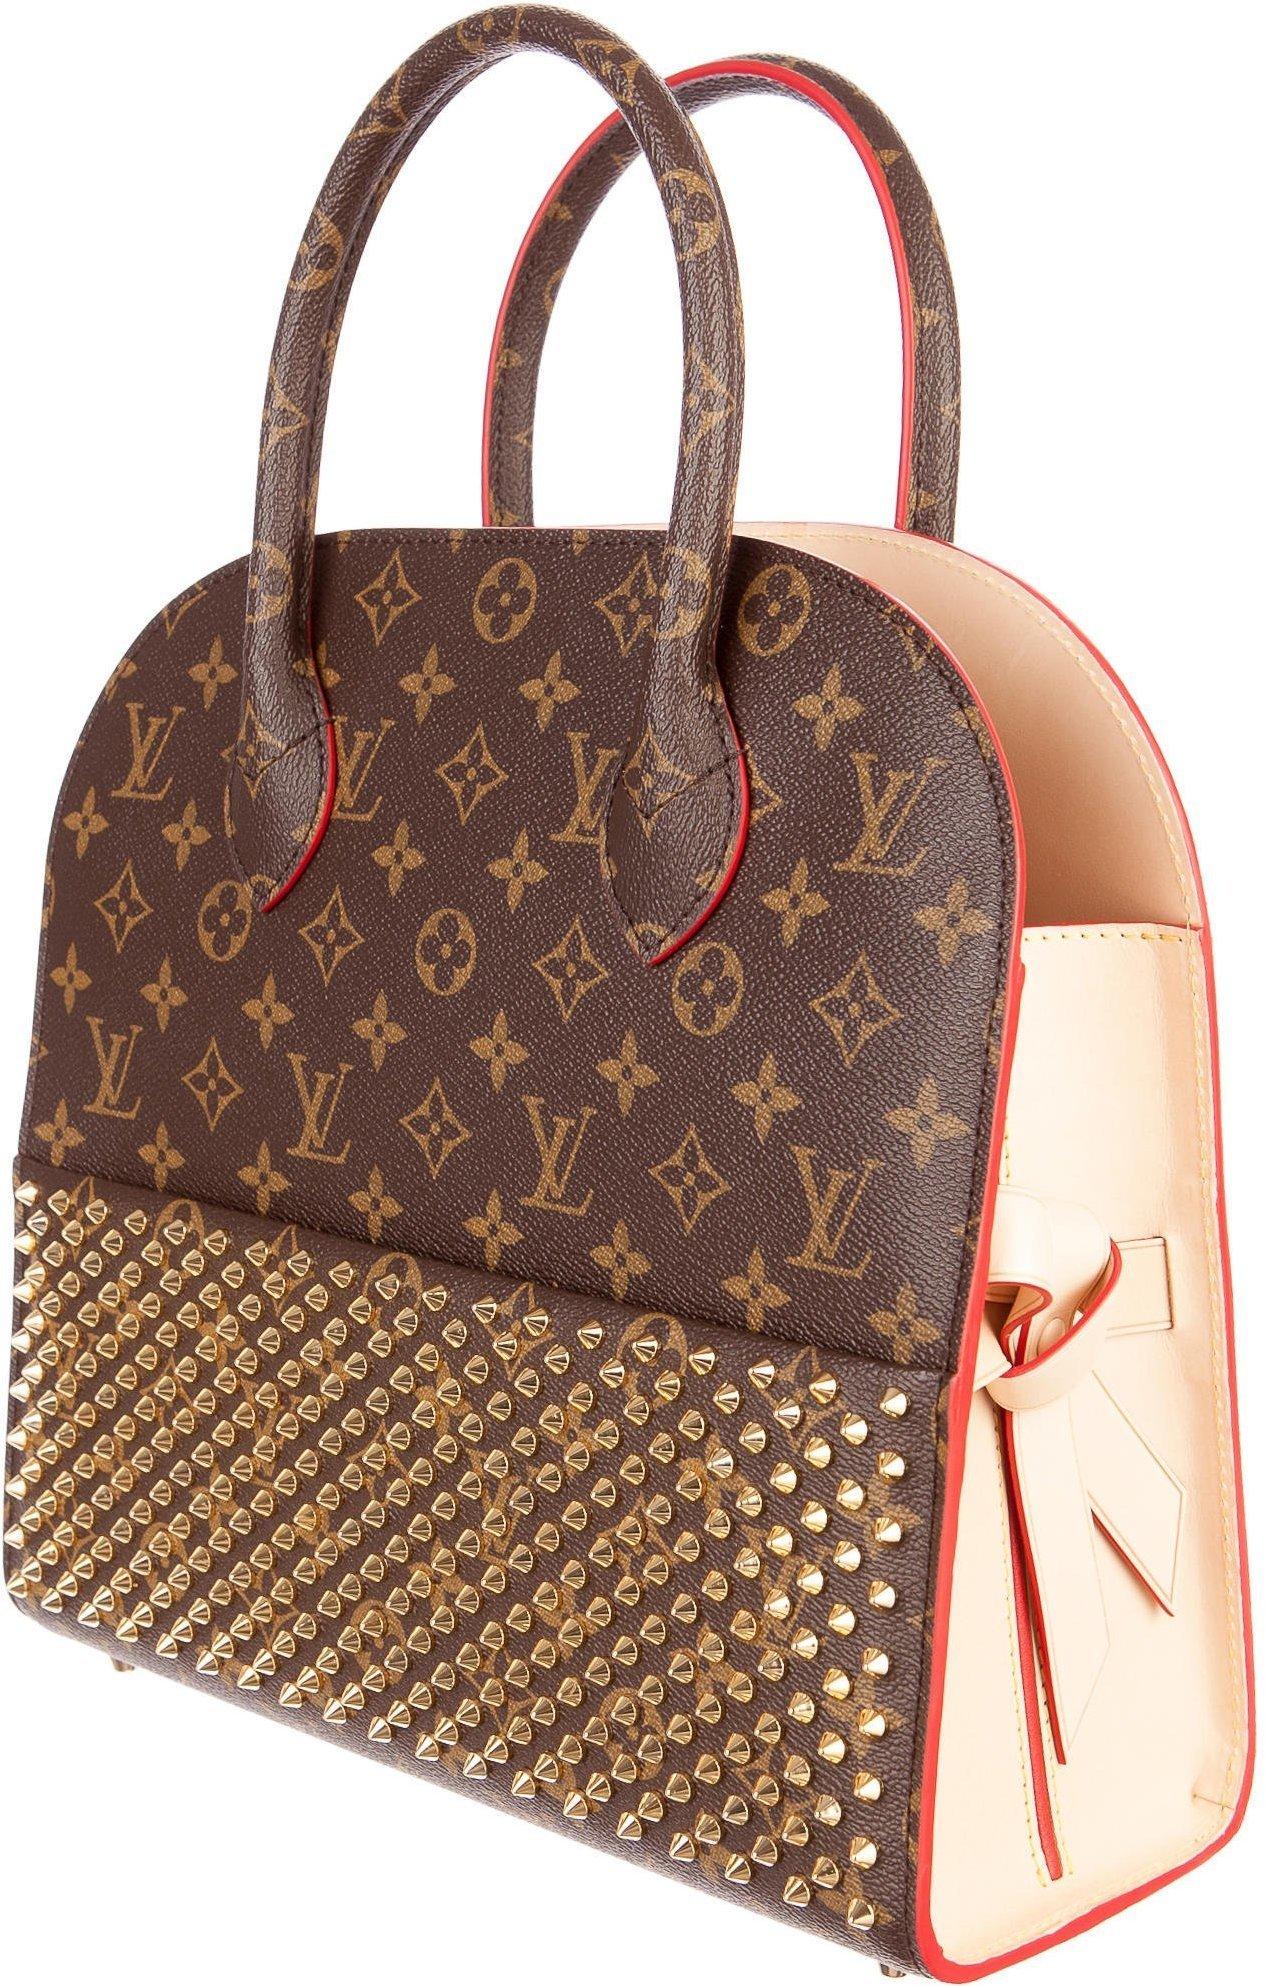 louis vuitton shopping bag christian louboutin monogram brown red